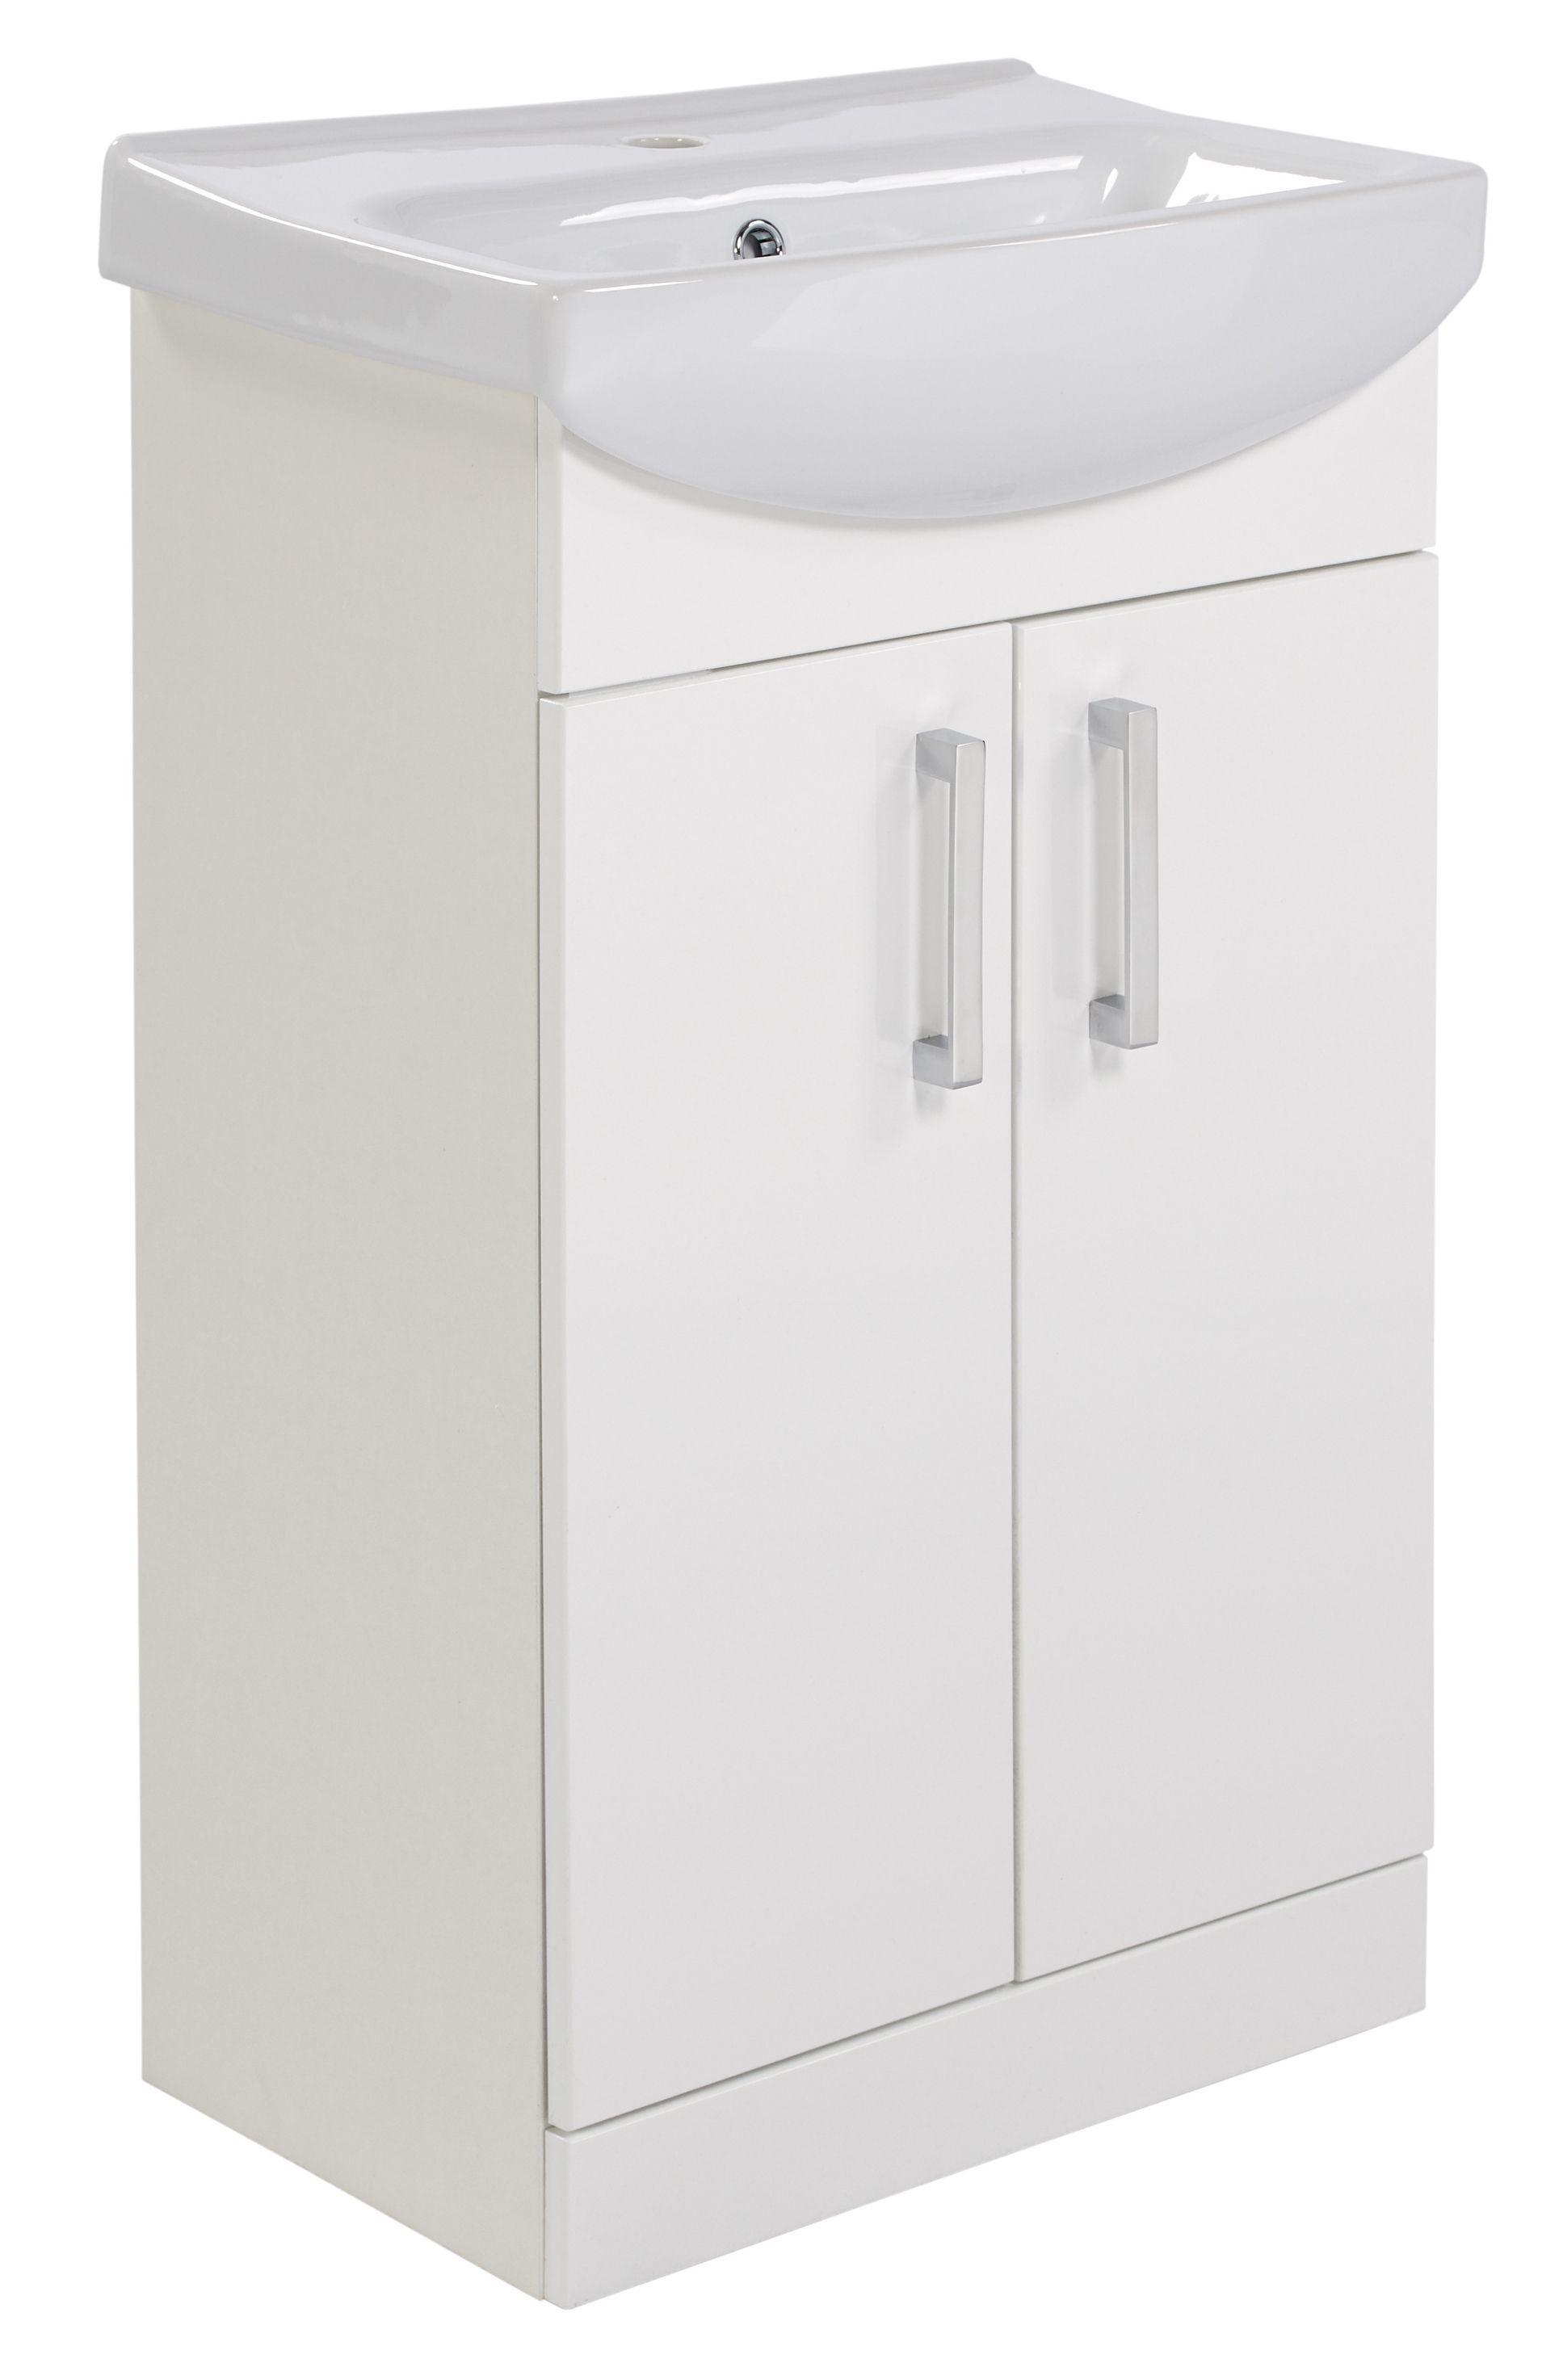 Ardenno Gloss White Vanity Unit Basin Set W 550mm Departments Diy At B Q